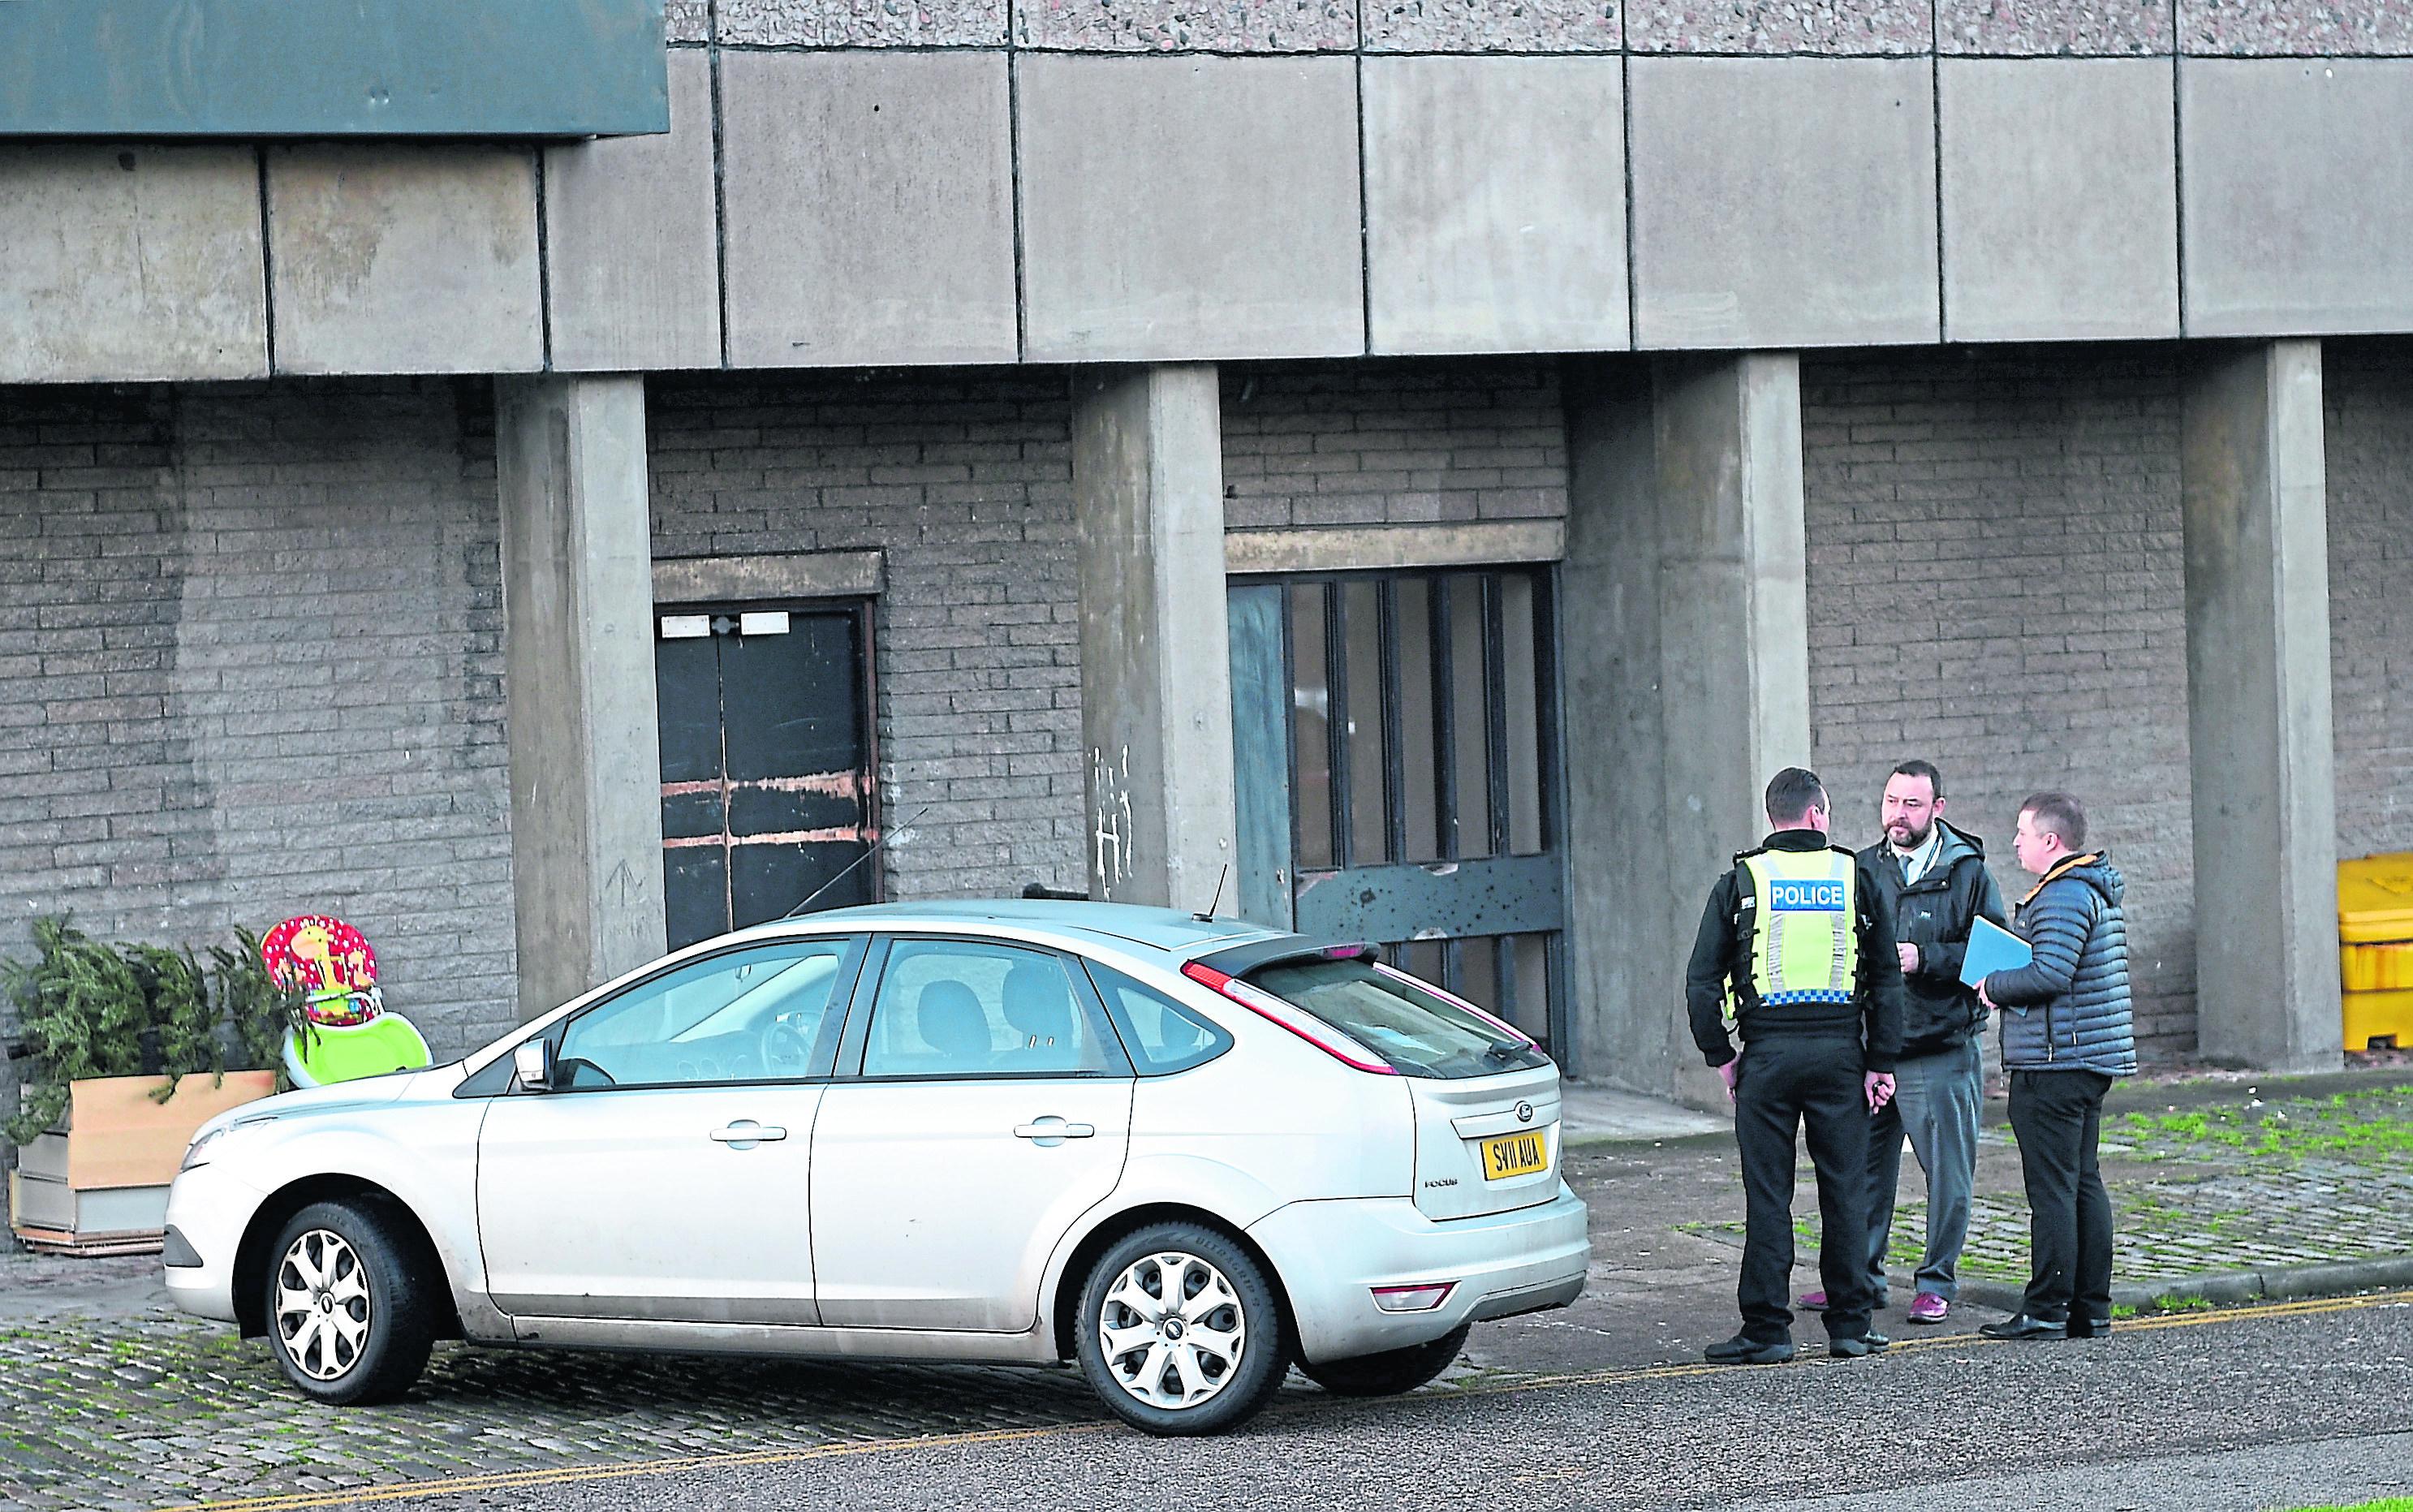 Police attending an incident at Donside Court, Tillydrone, Aberdeen.